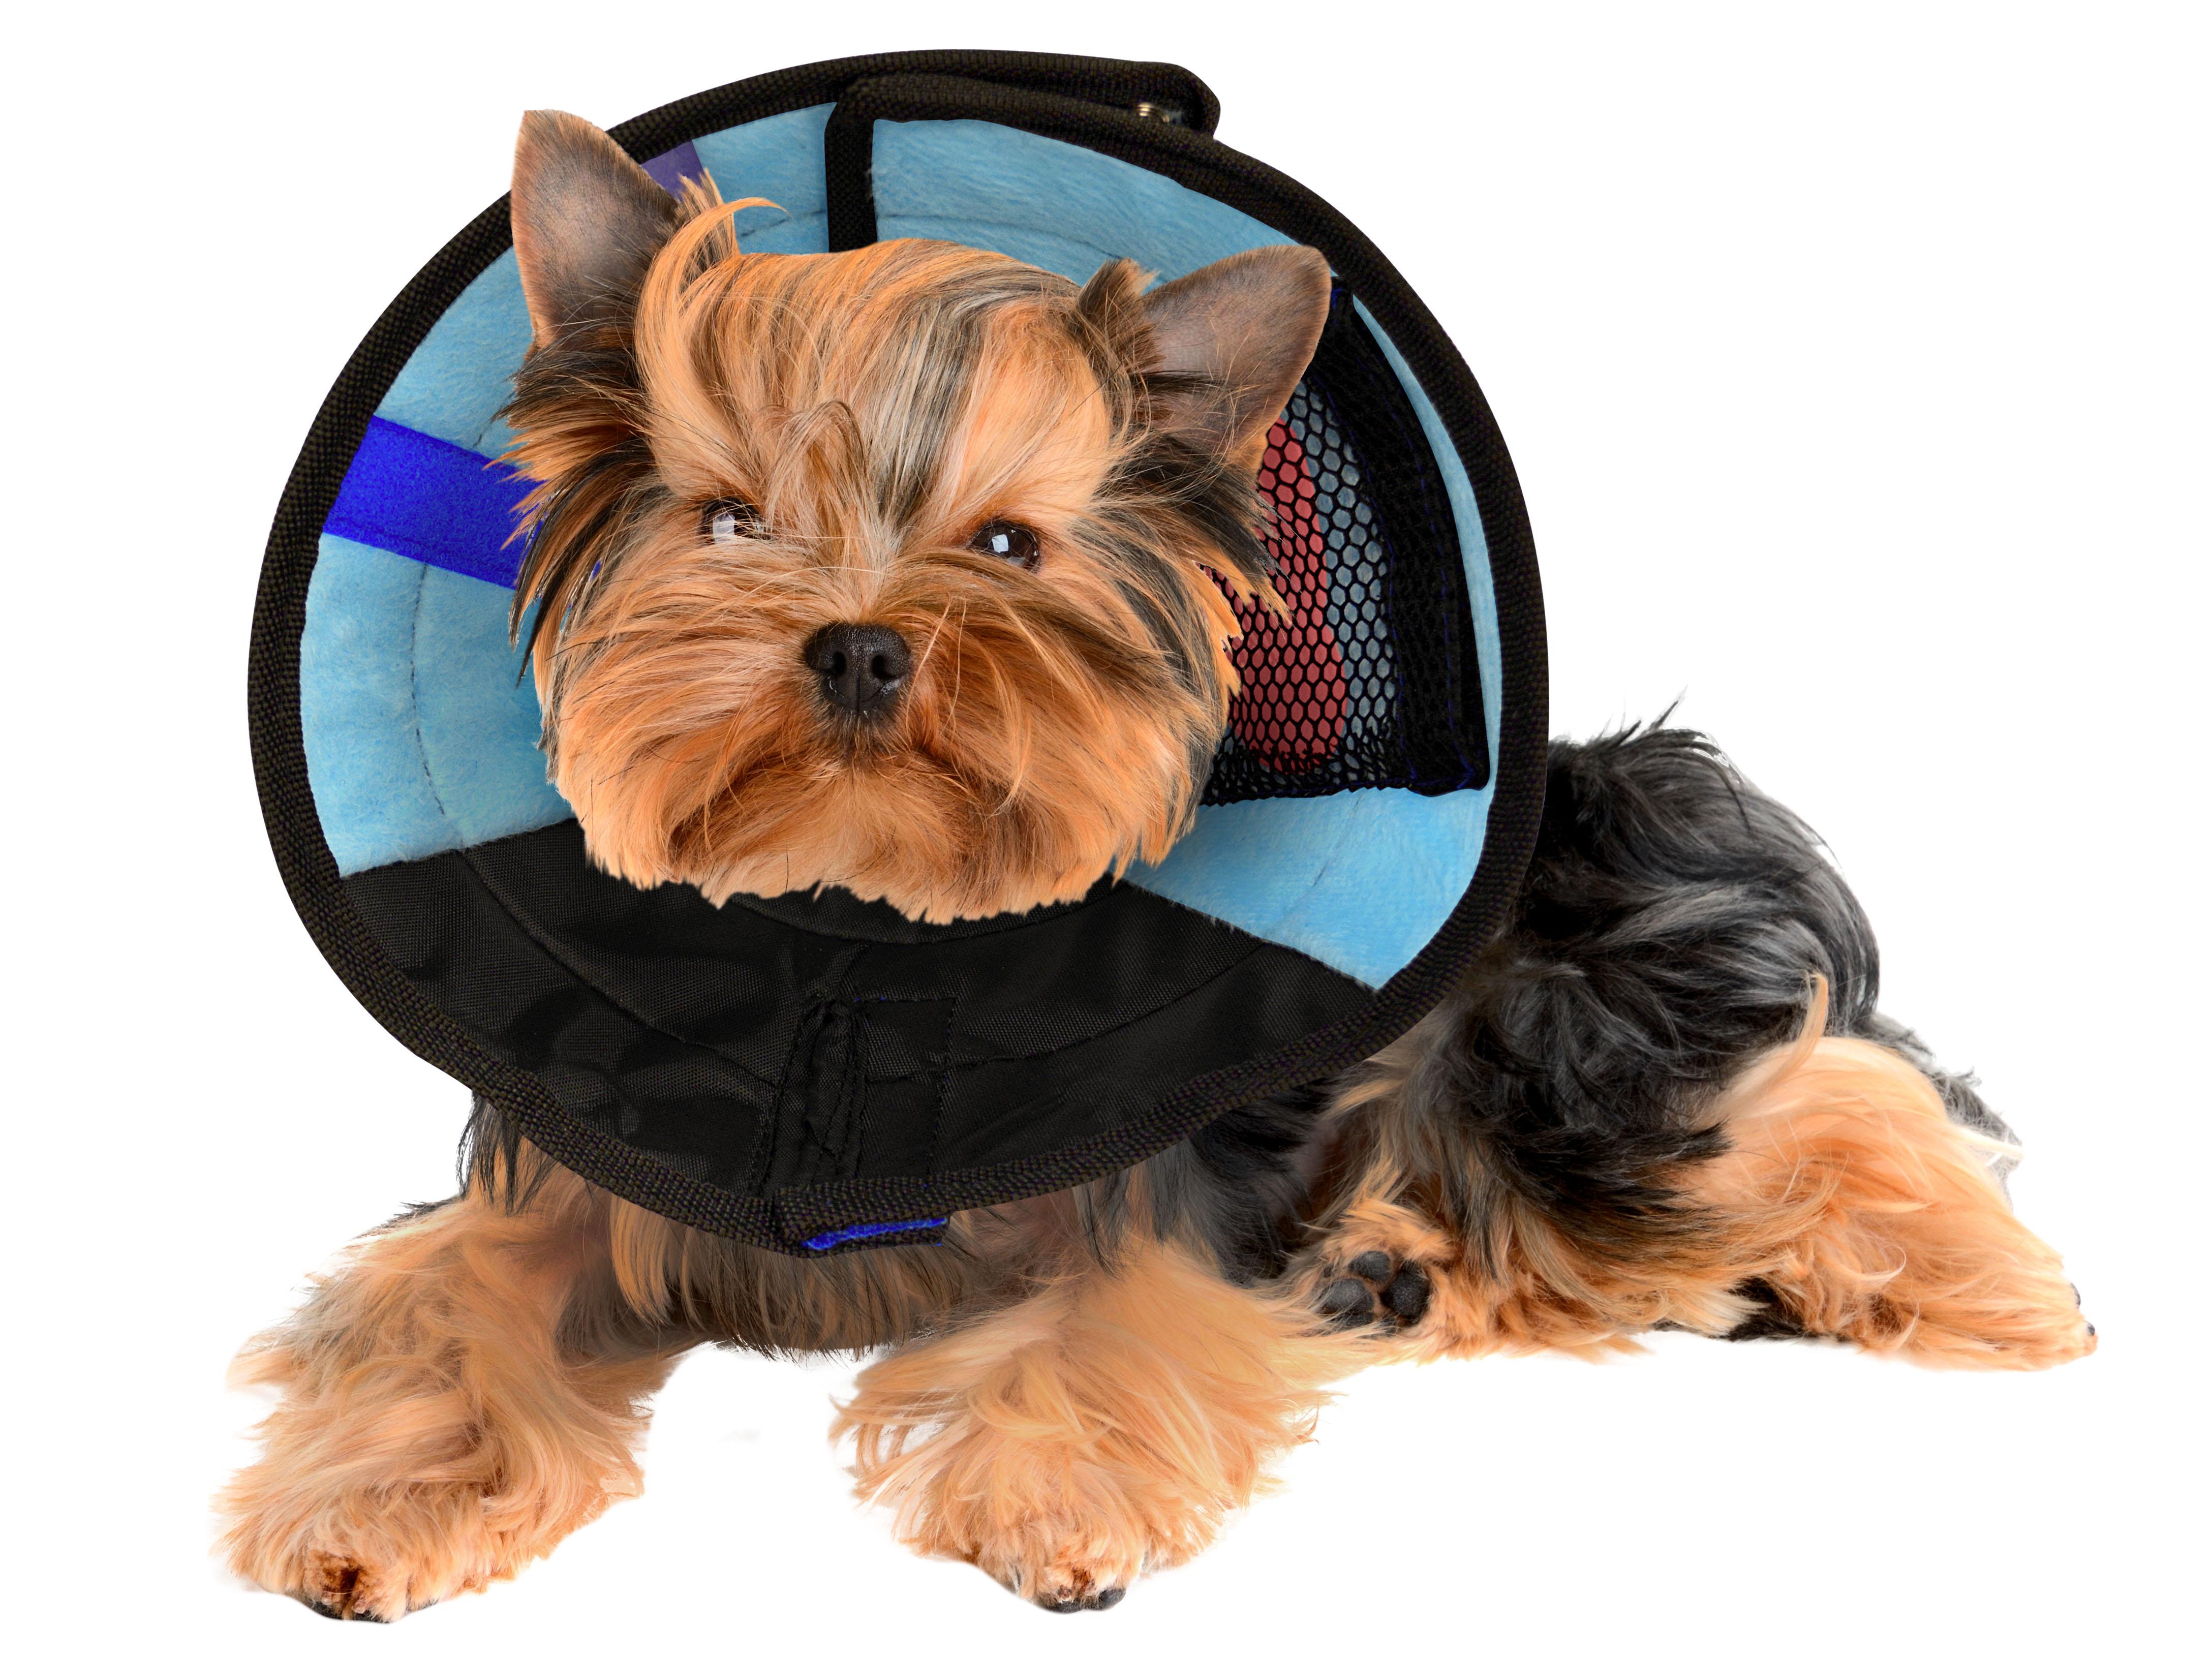 soft collar on small dog